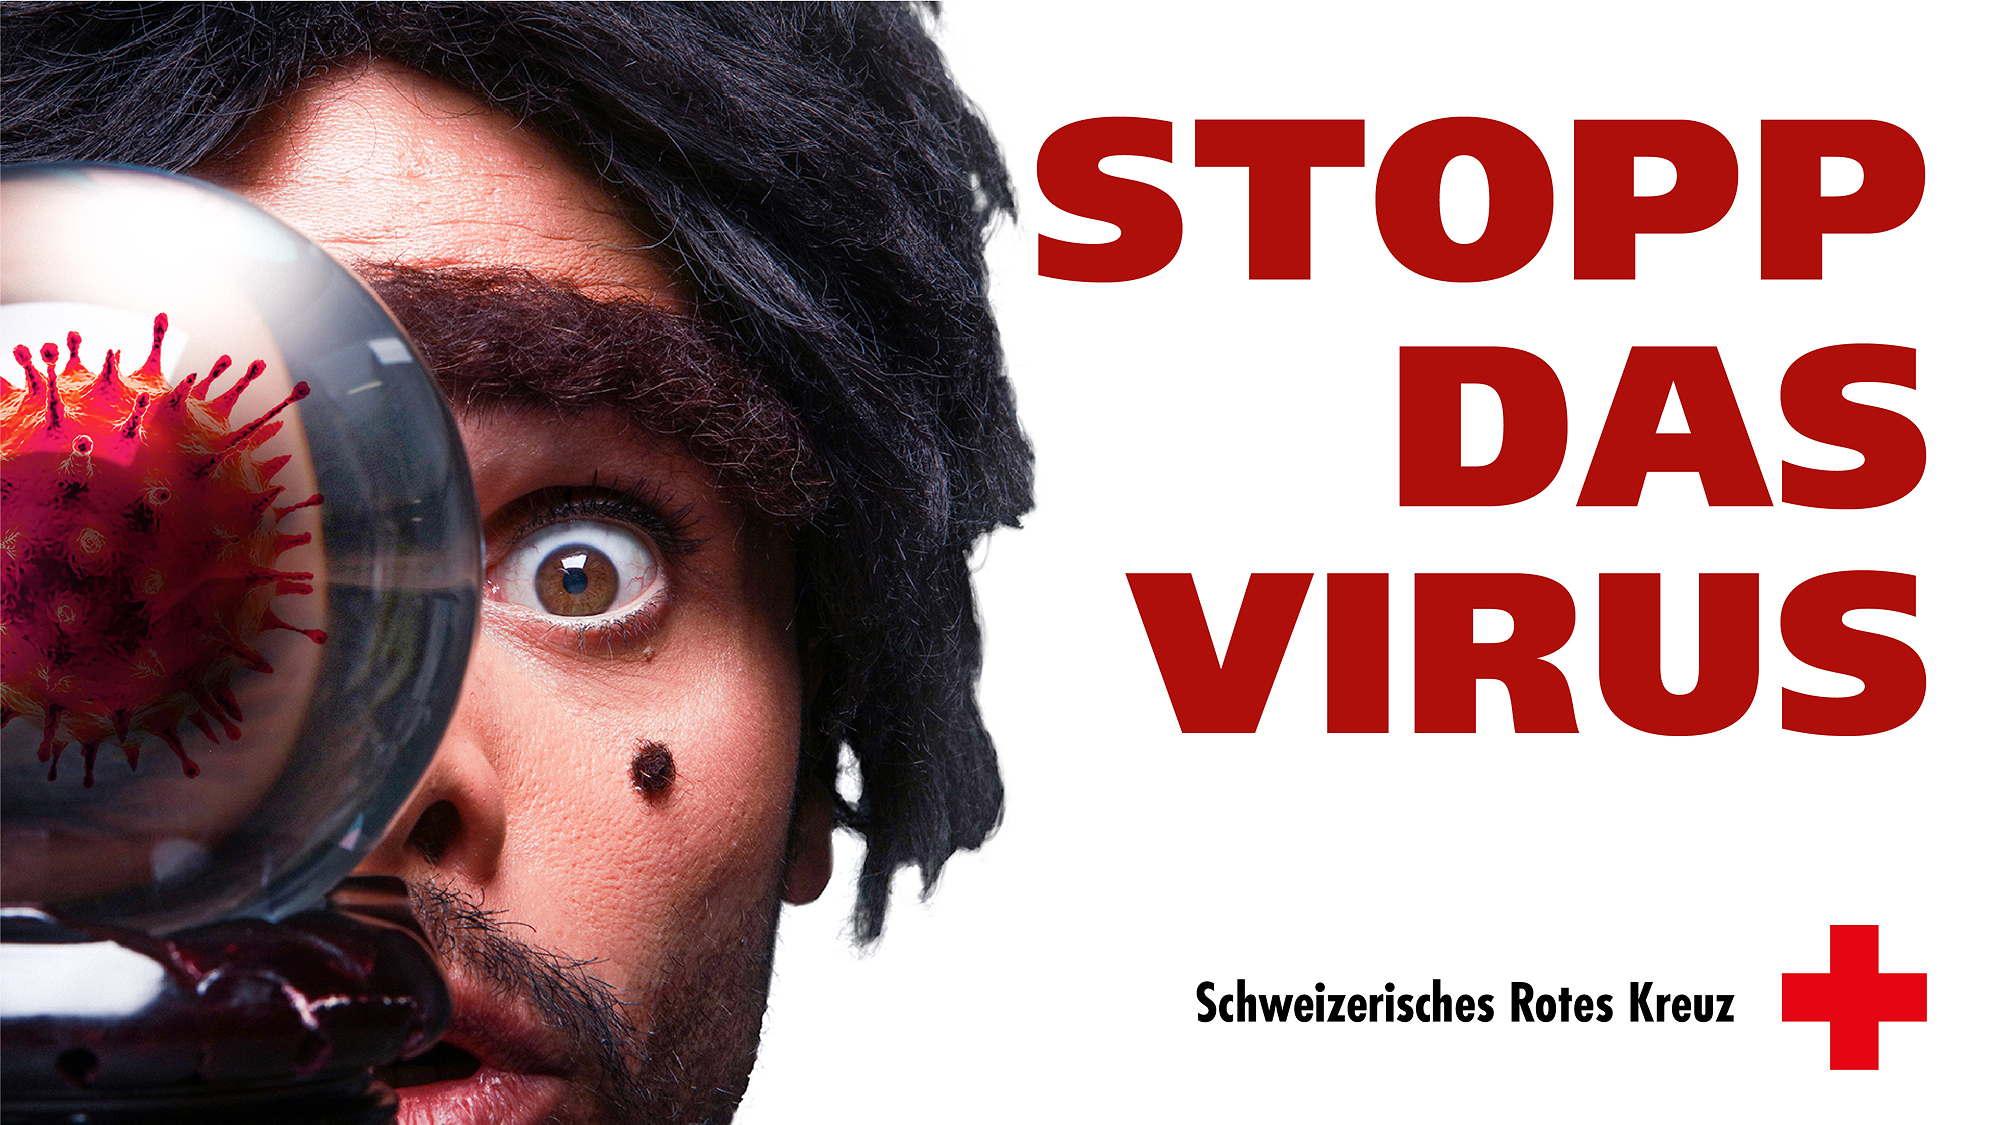 STOPP DAS VIRUS